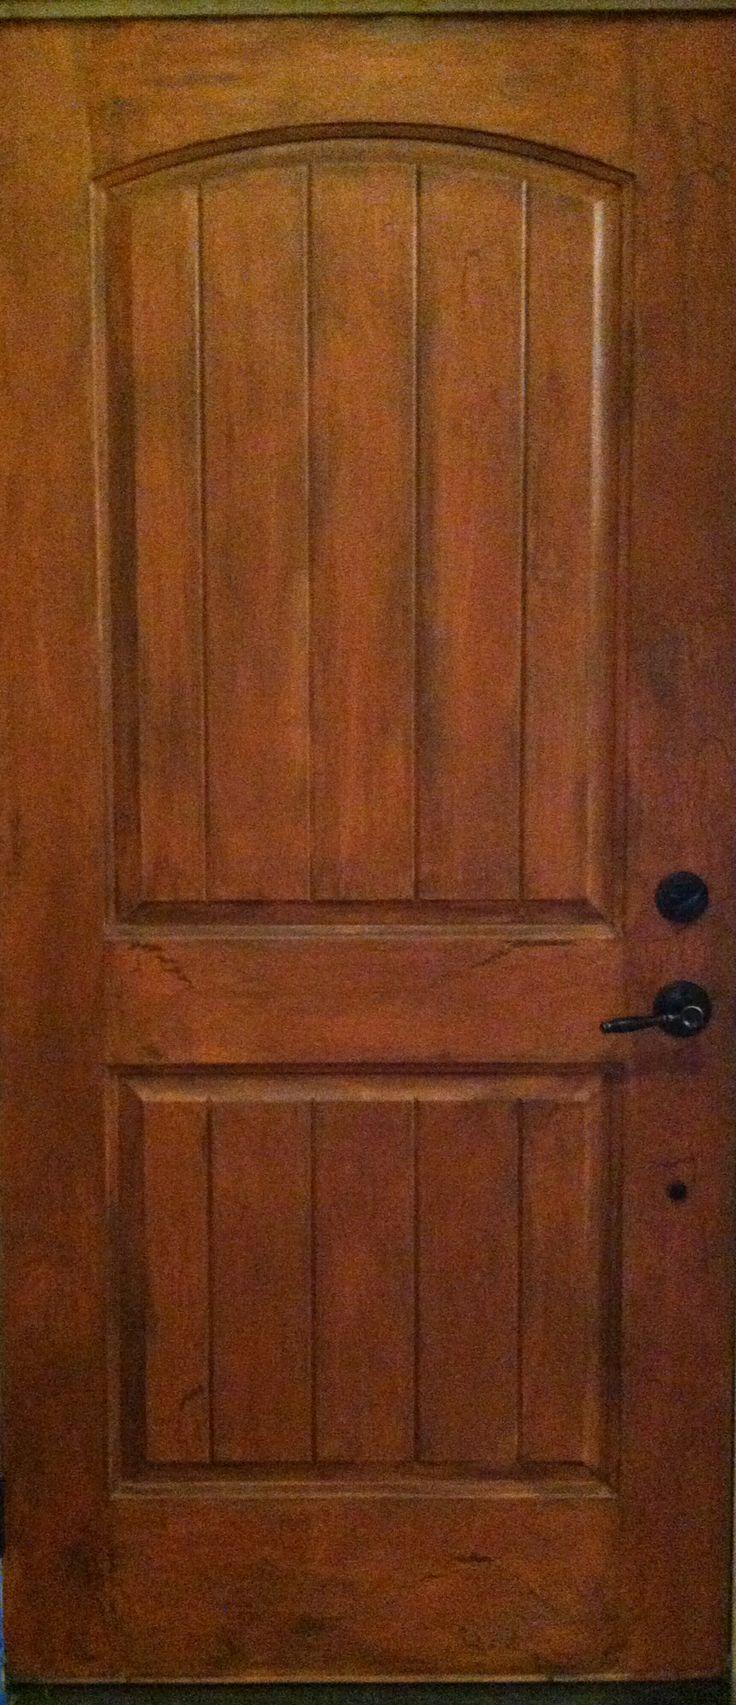 My Front Door Interior Brand New Fiberglass Door I Used Brown For A Base Coat Brushed A